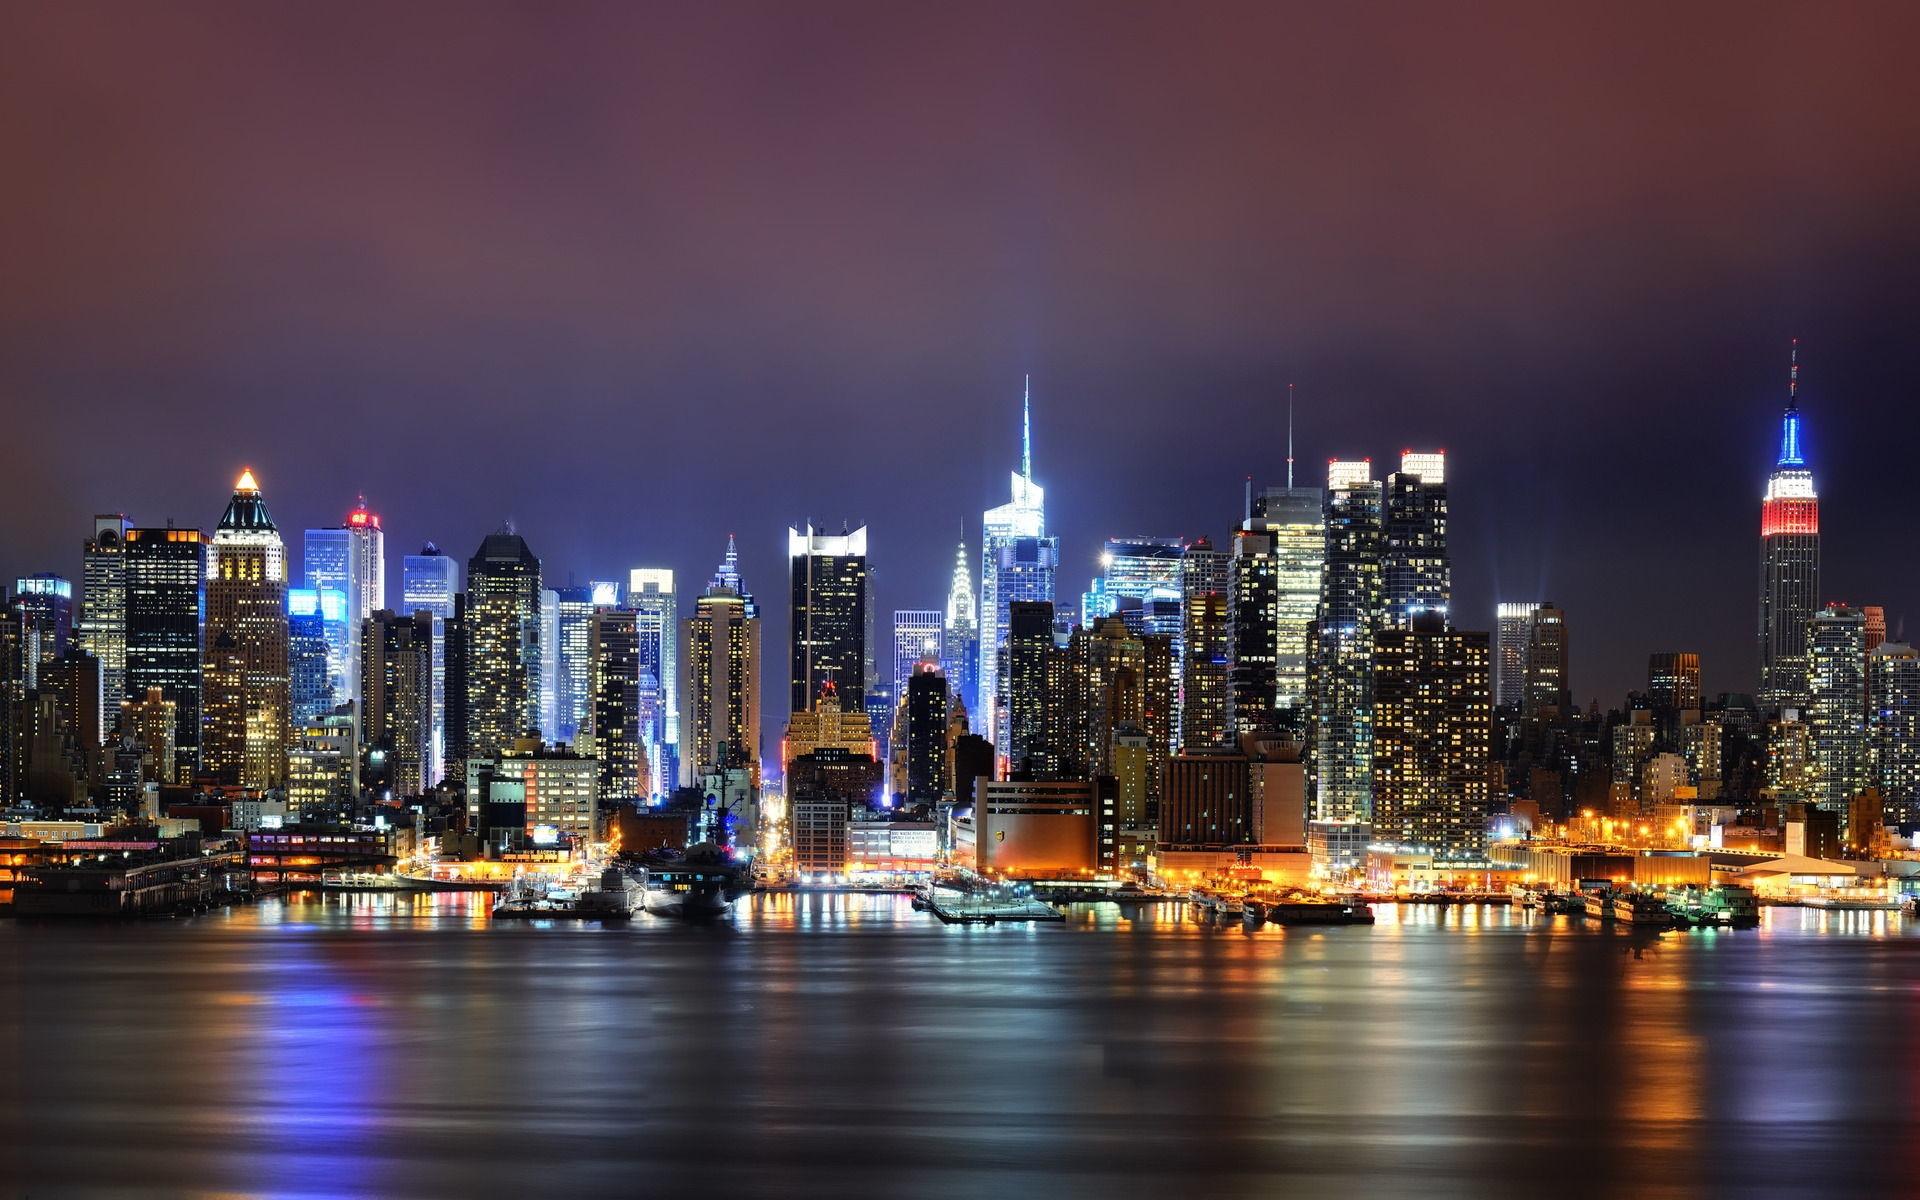 2560x1600 Bokeh Lights City Night Wallpaper